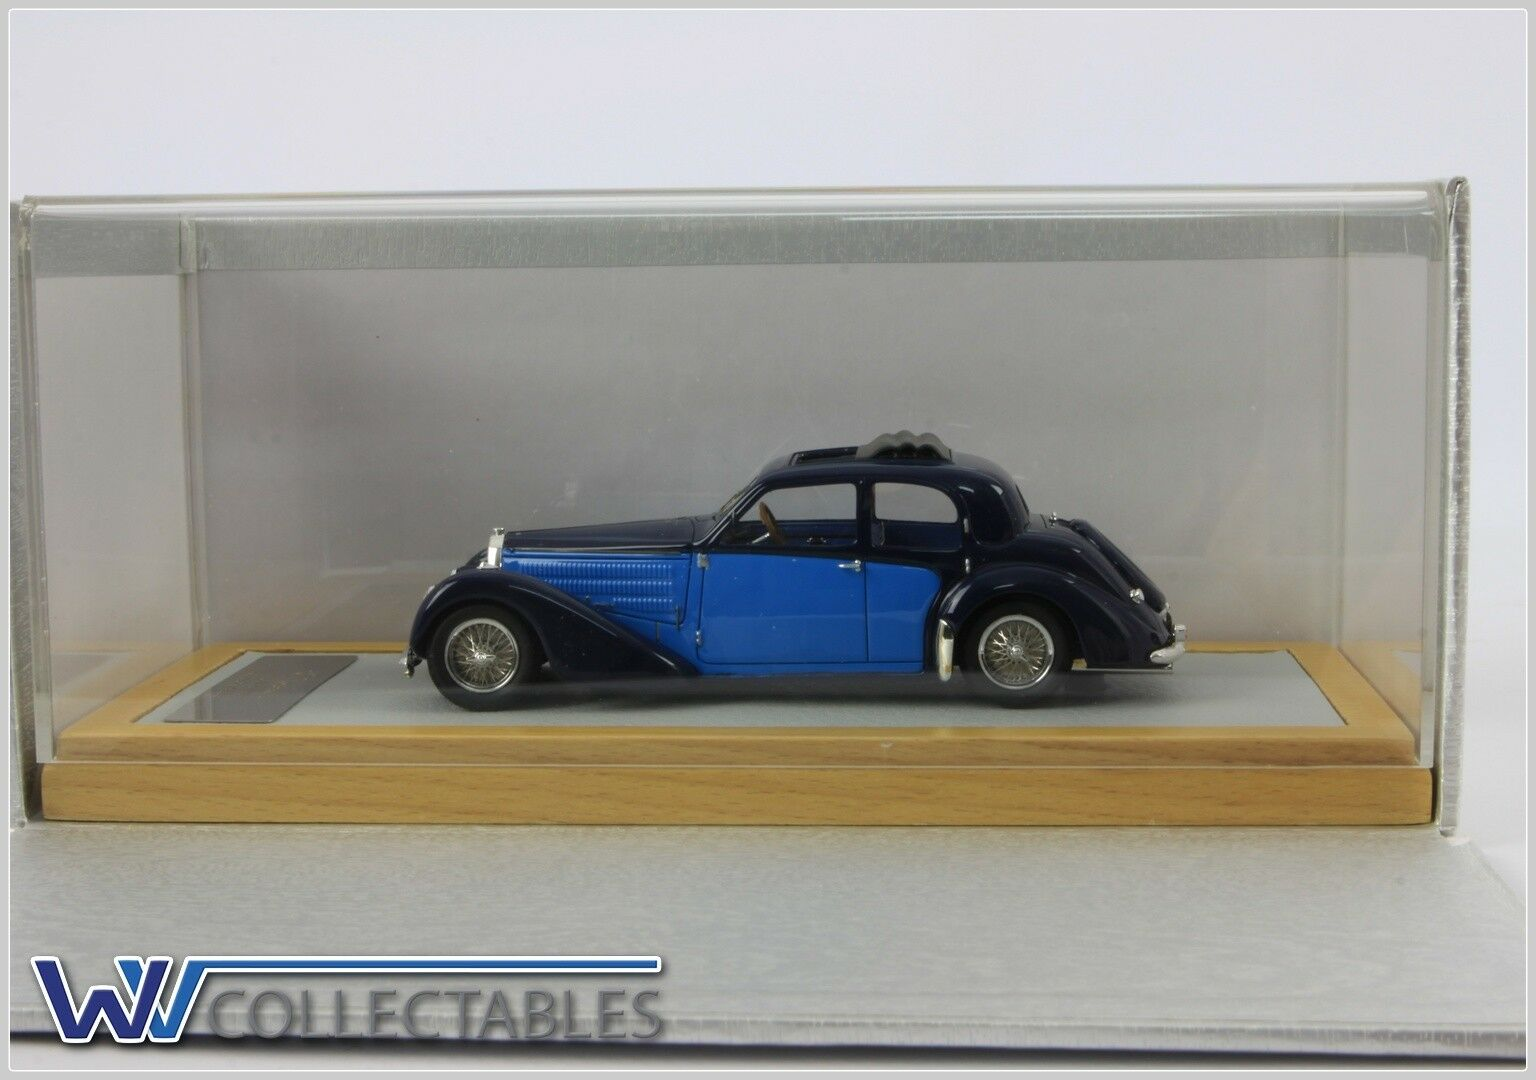 Bugatti t57 galibier 1937 sn57603 2 Tone 1 99 pieces ilario Chromes 1 43 cromático 054